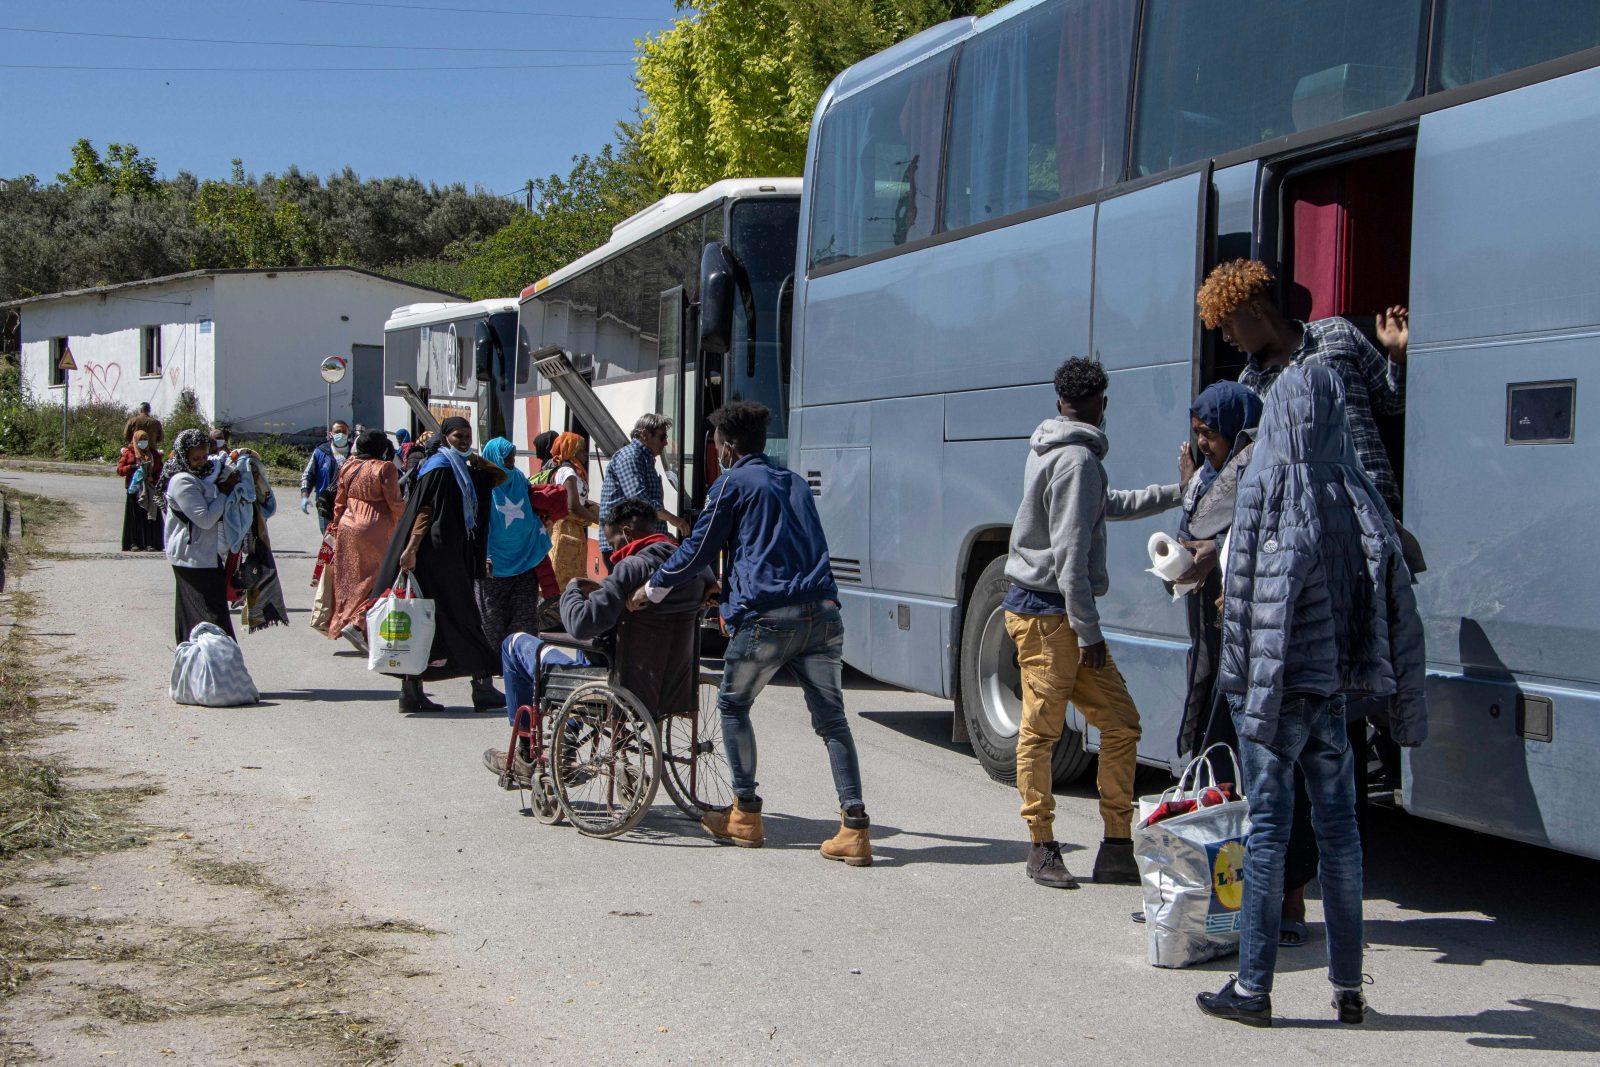 Migranten aus Afrika im Flüchtlingslager Moria in Griechenland Foto: picture alliance / NurPhoto